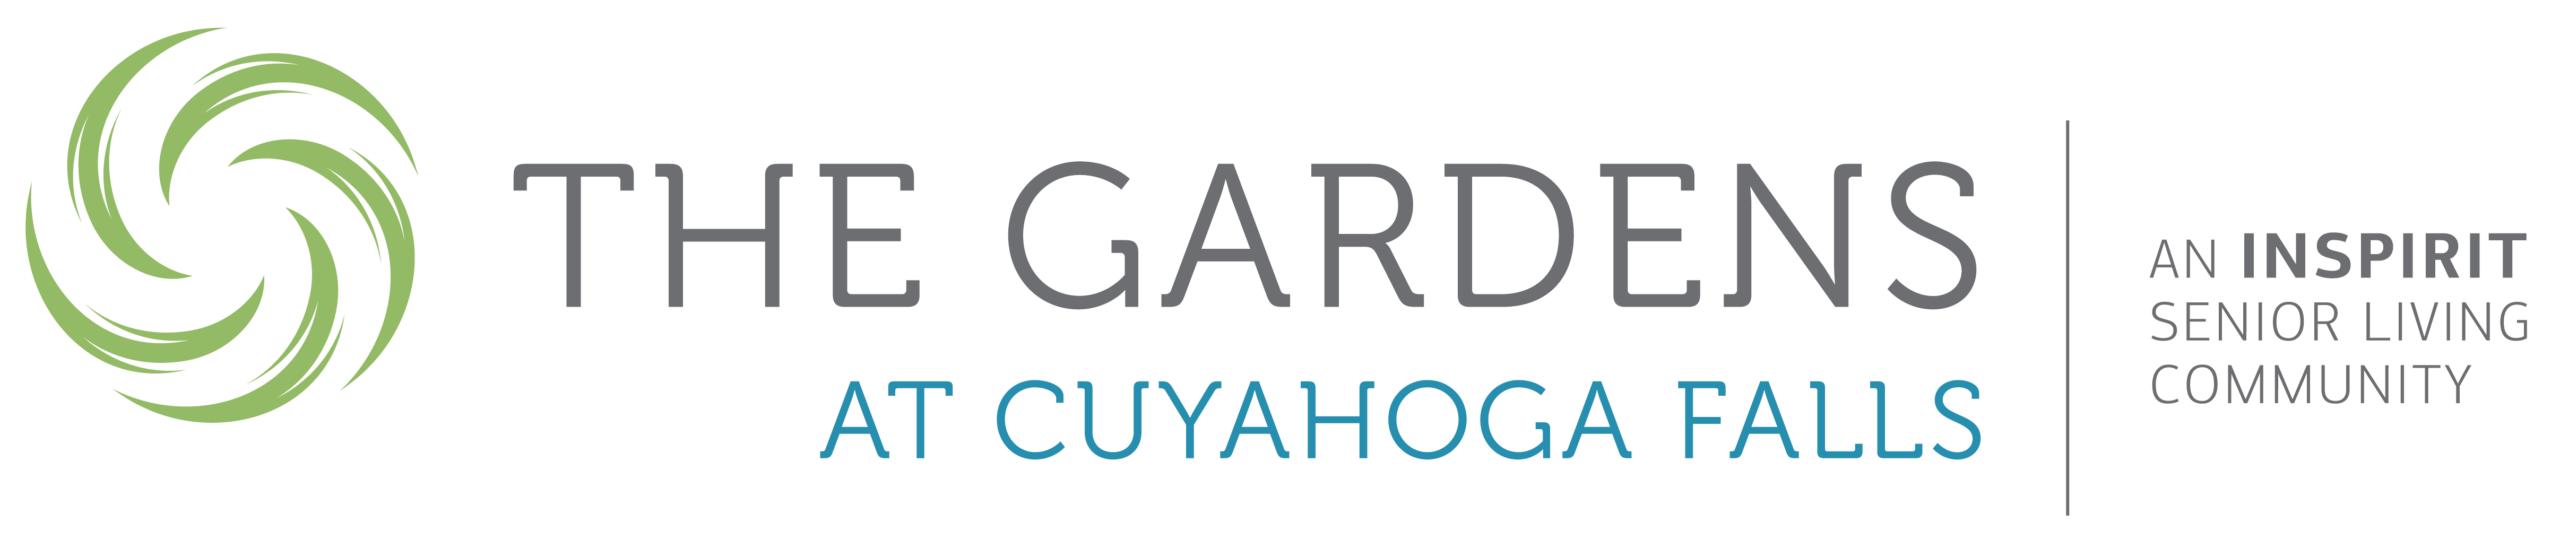 The Gardens at Cuyahoga Falls logo